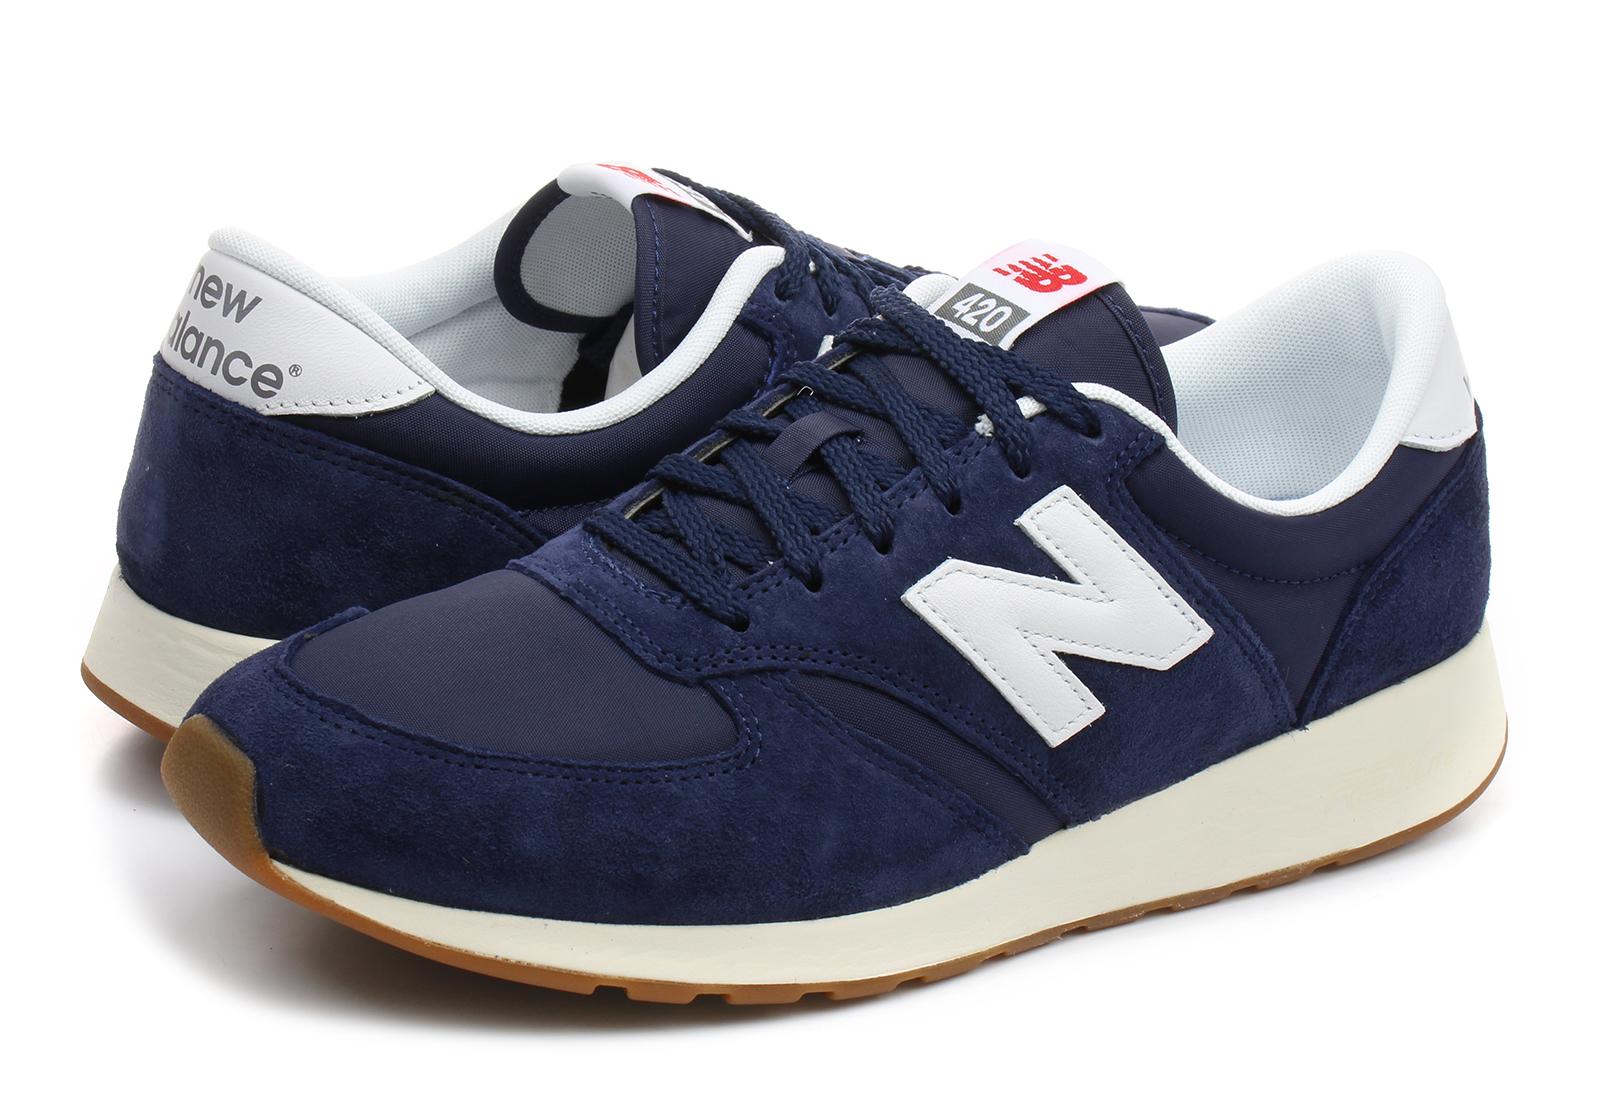 new balance mrl 420 sg